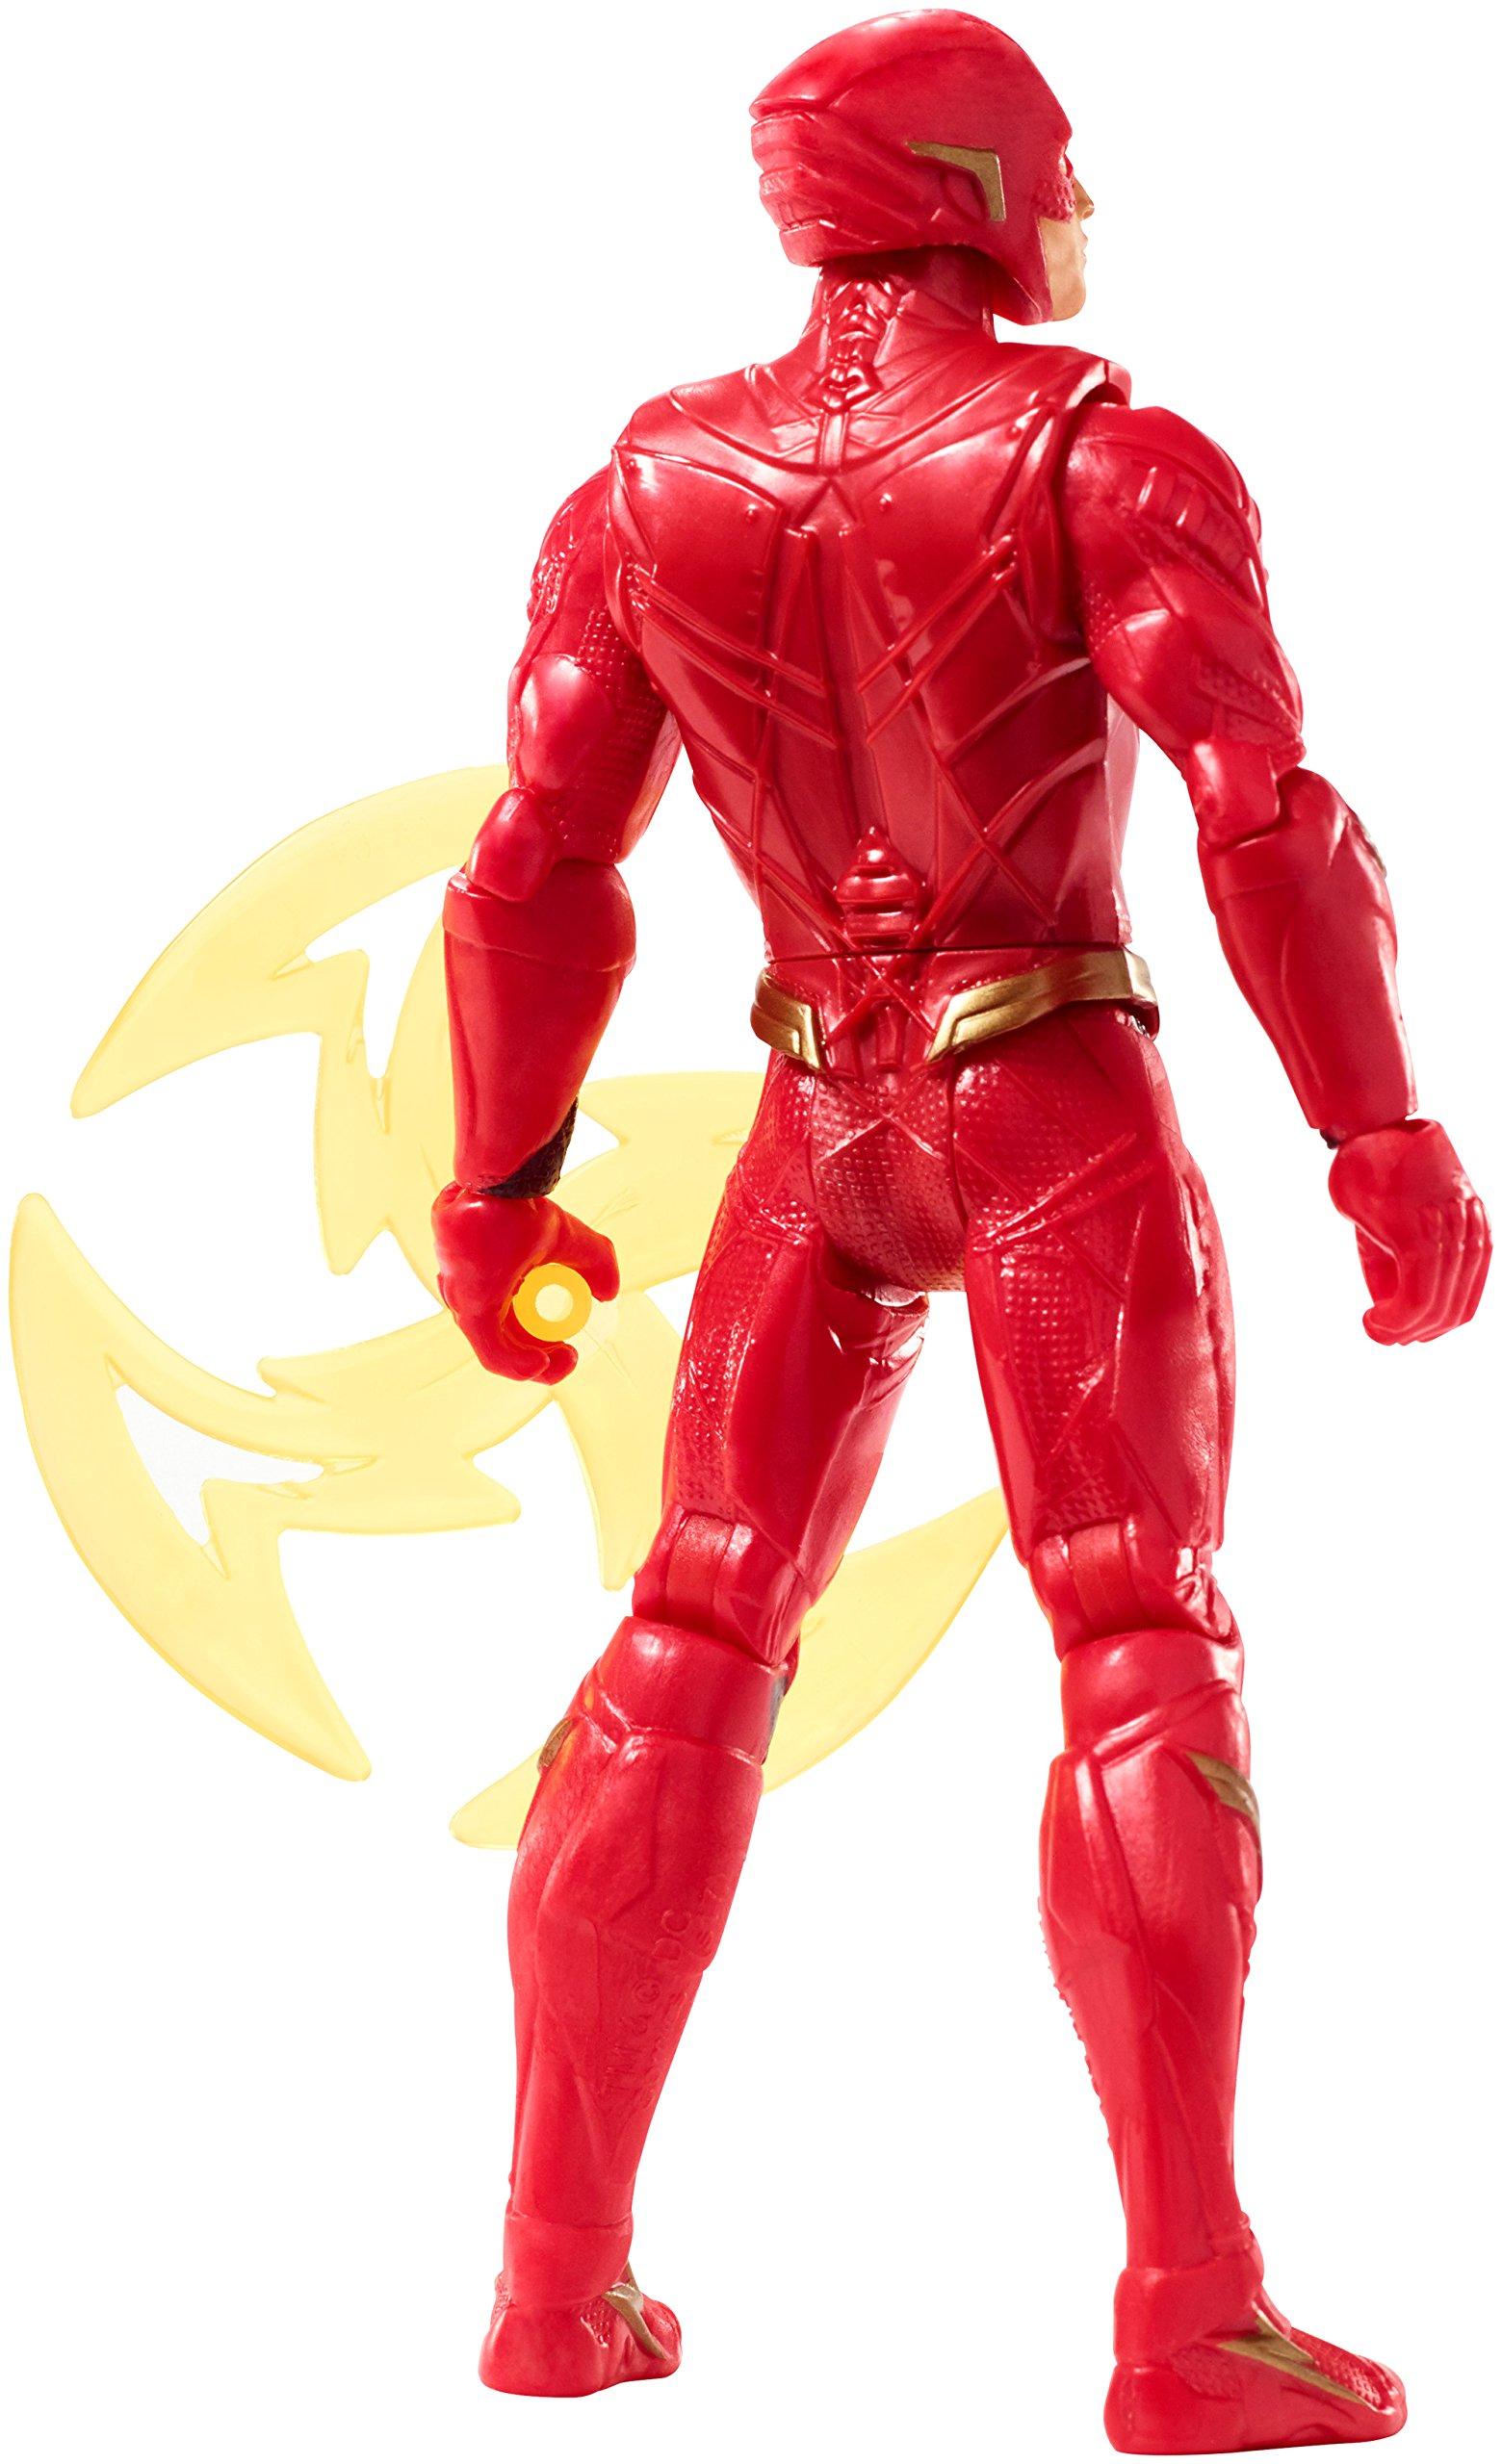 Justice League Figura básica Flash Core Suit, 15 cm (Mattel FGG64) product image